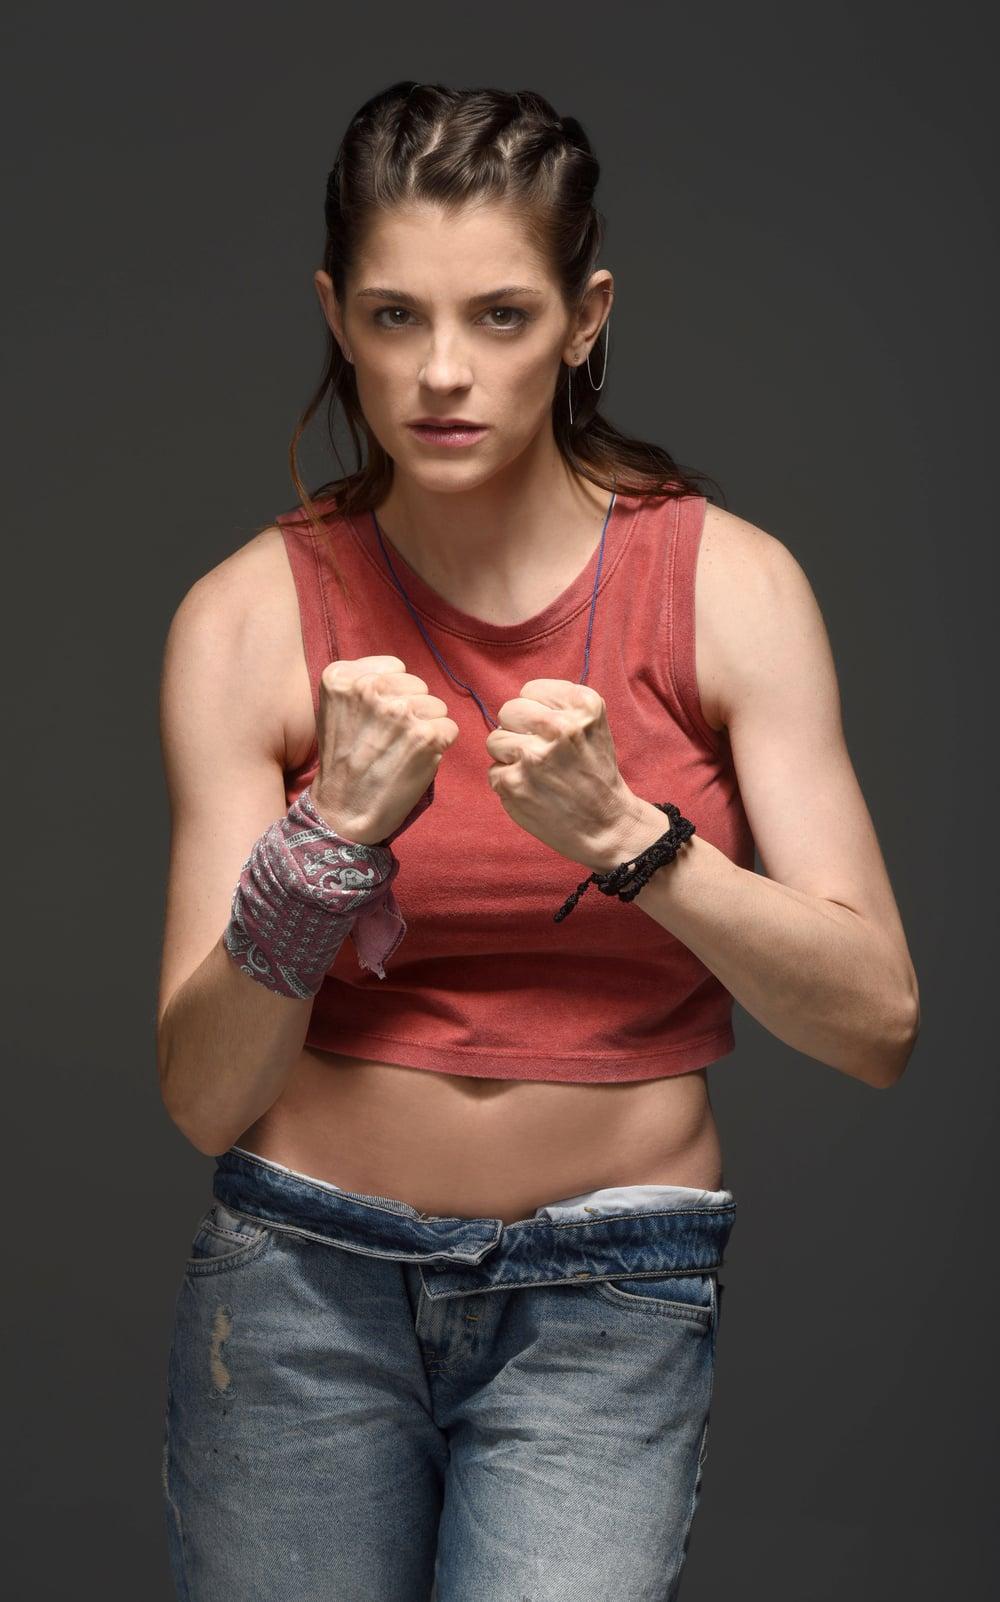 LQDC_Irene Azuela como Tania Muñoz_001.jpg